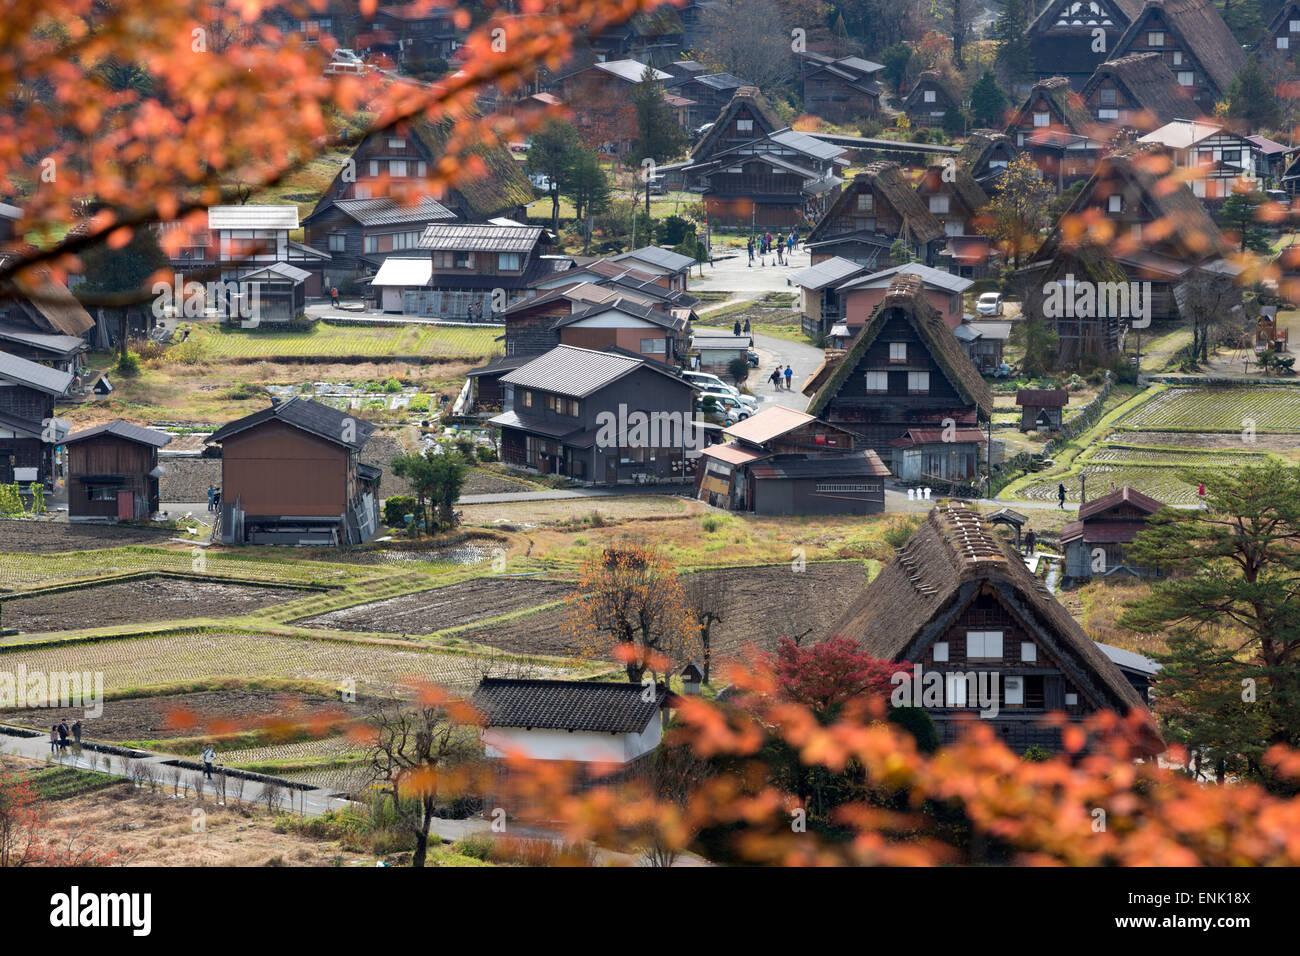 Gassho-zukuri folk houses, Ogimachi village, Shirakawa-go, near Takayama, Central Honshu, Japan, Asia Stock Photo